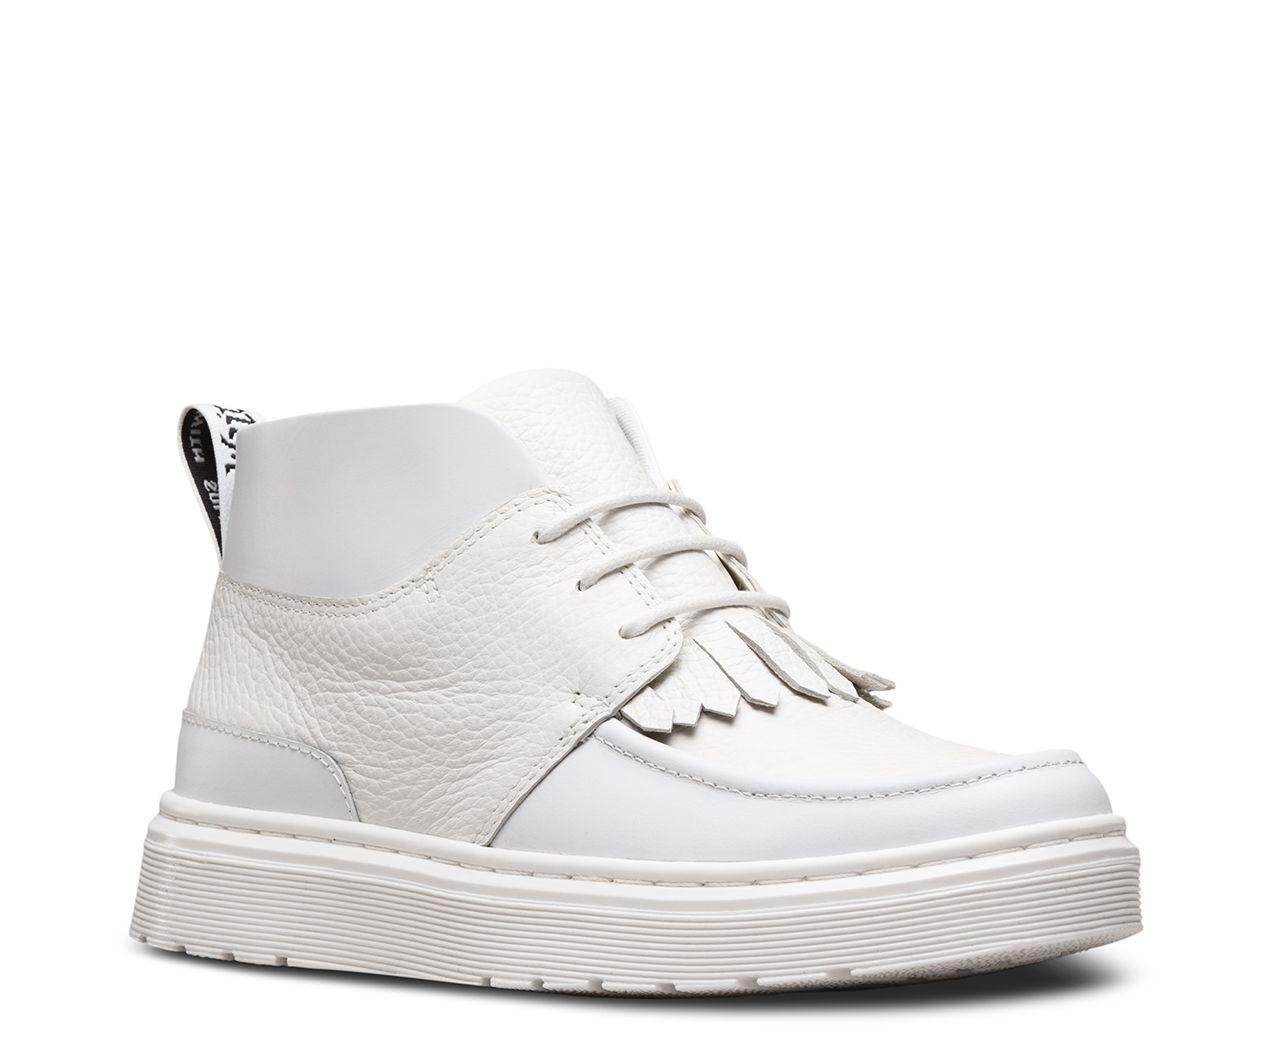 DR MARTENS JEMIMA AUNT SALLY. White Leather ShoesWhite BootsWomen's ...